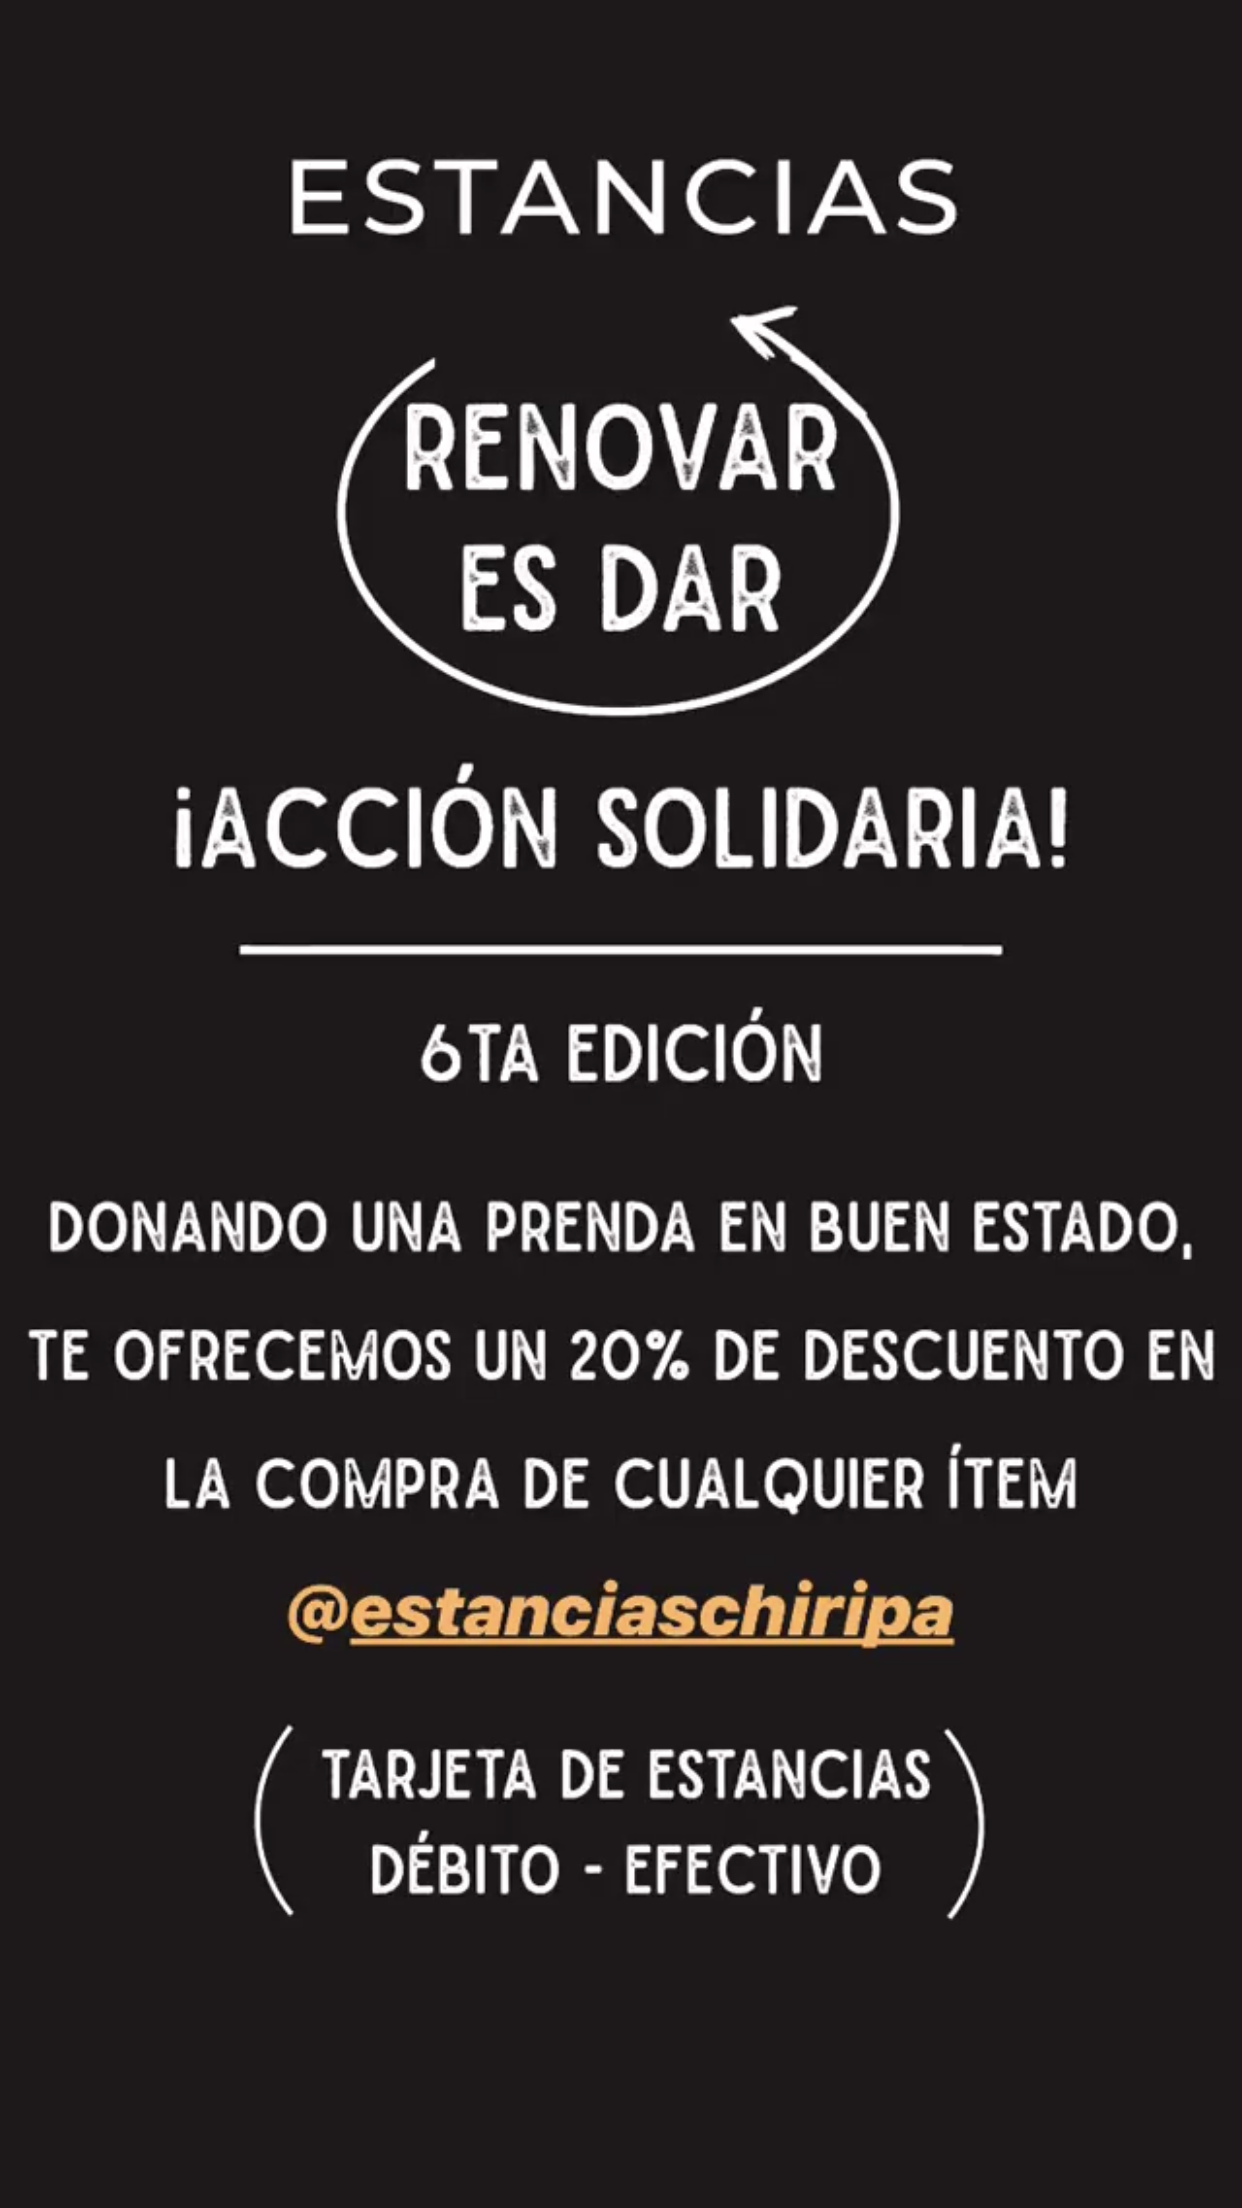 ESTANCIAS CHIRIPA